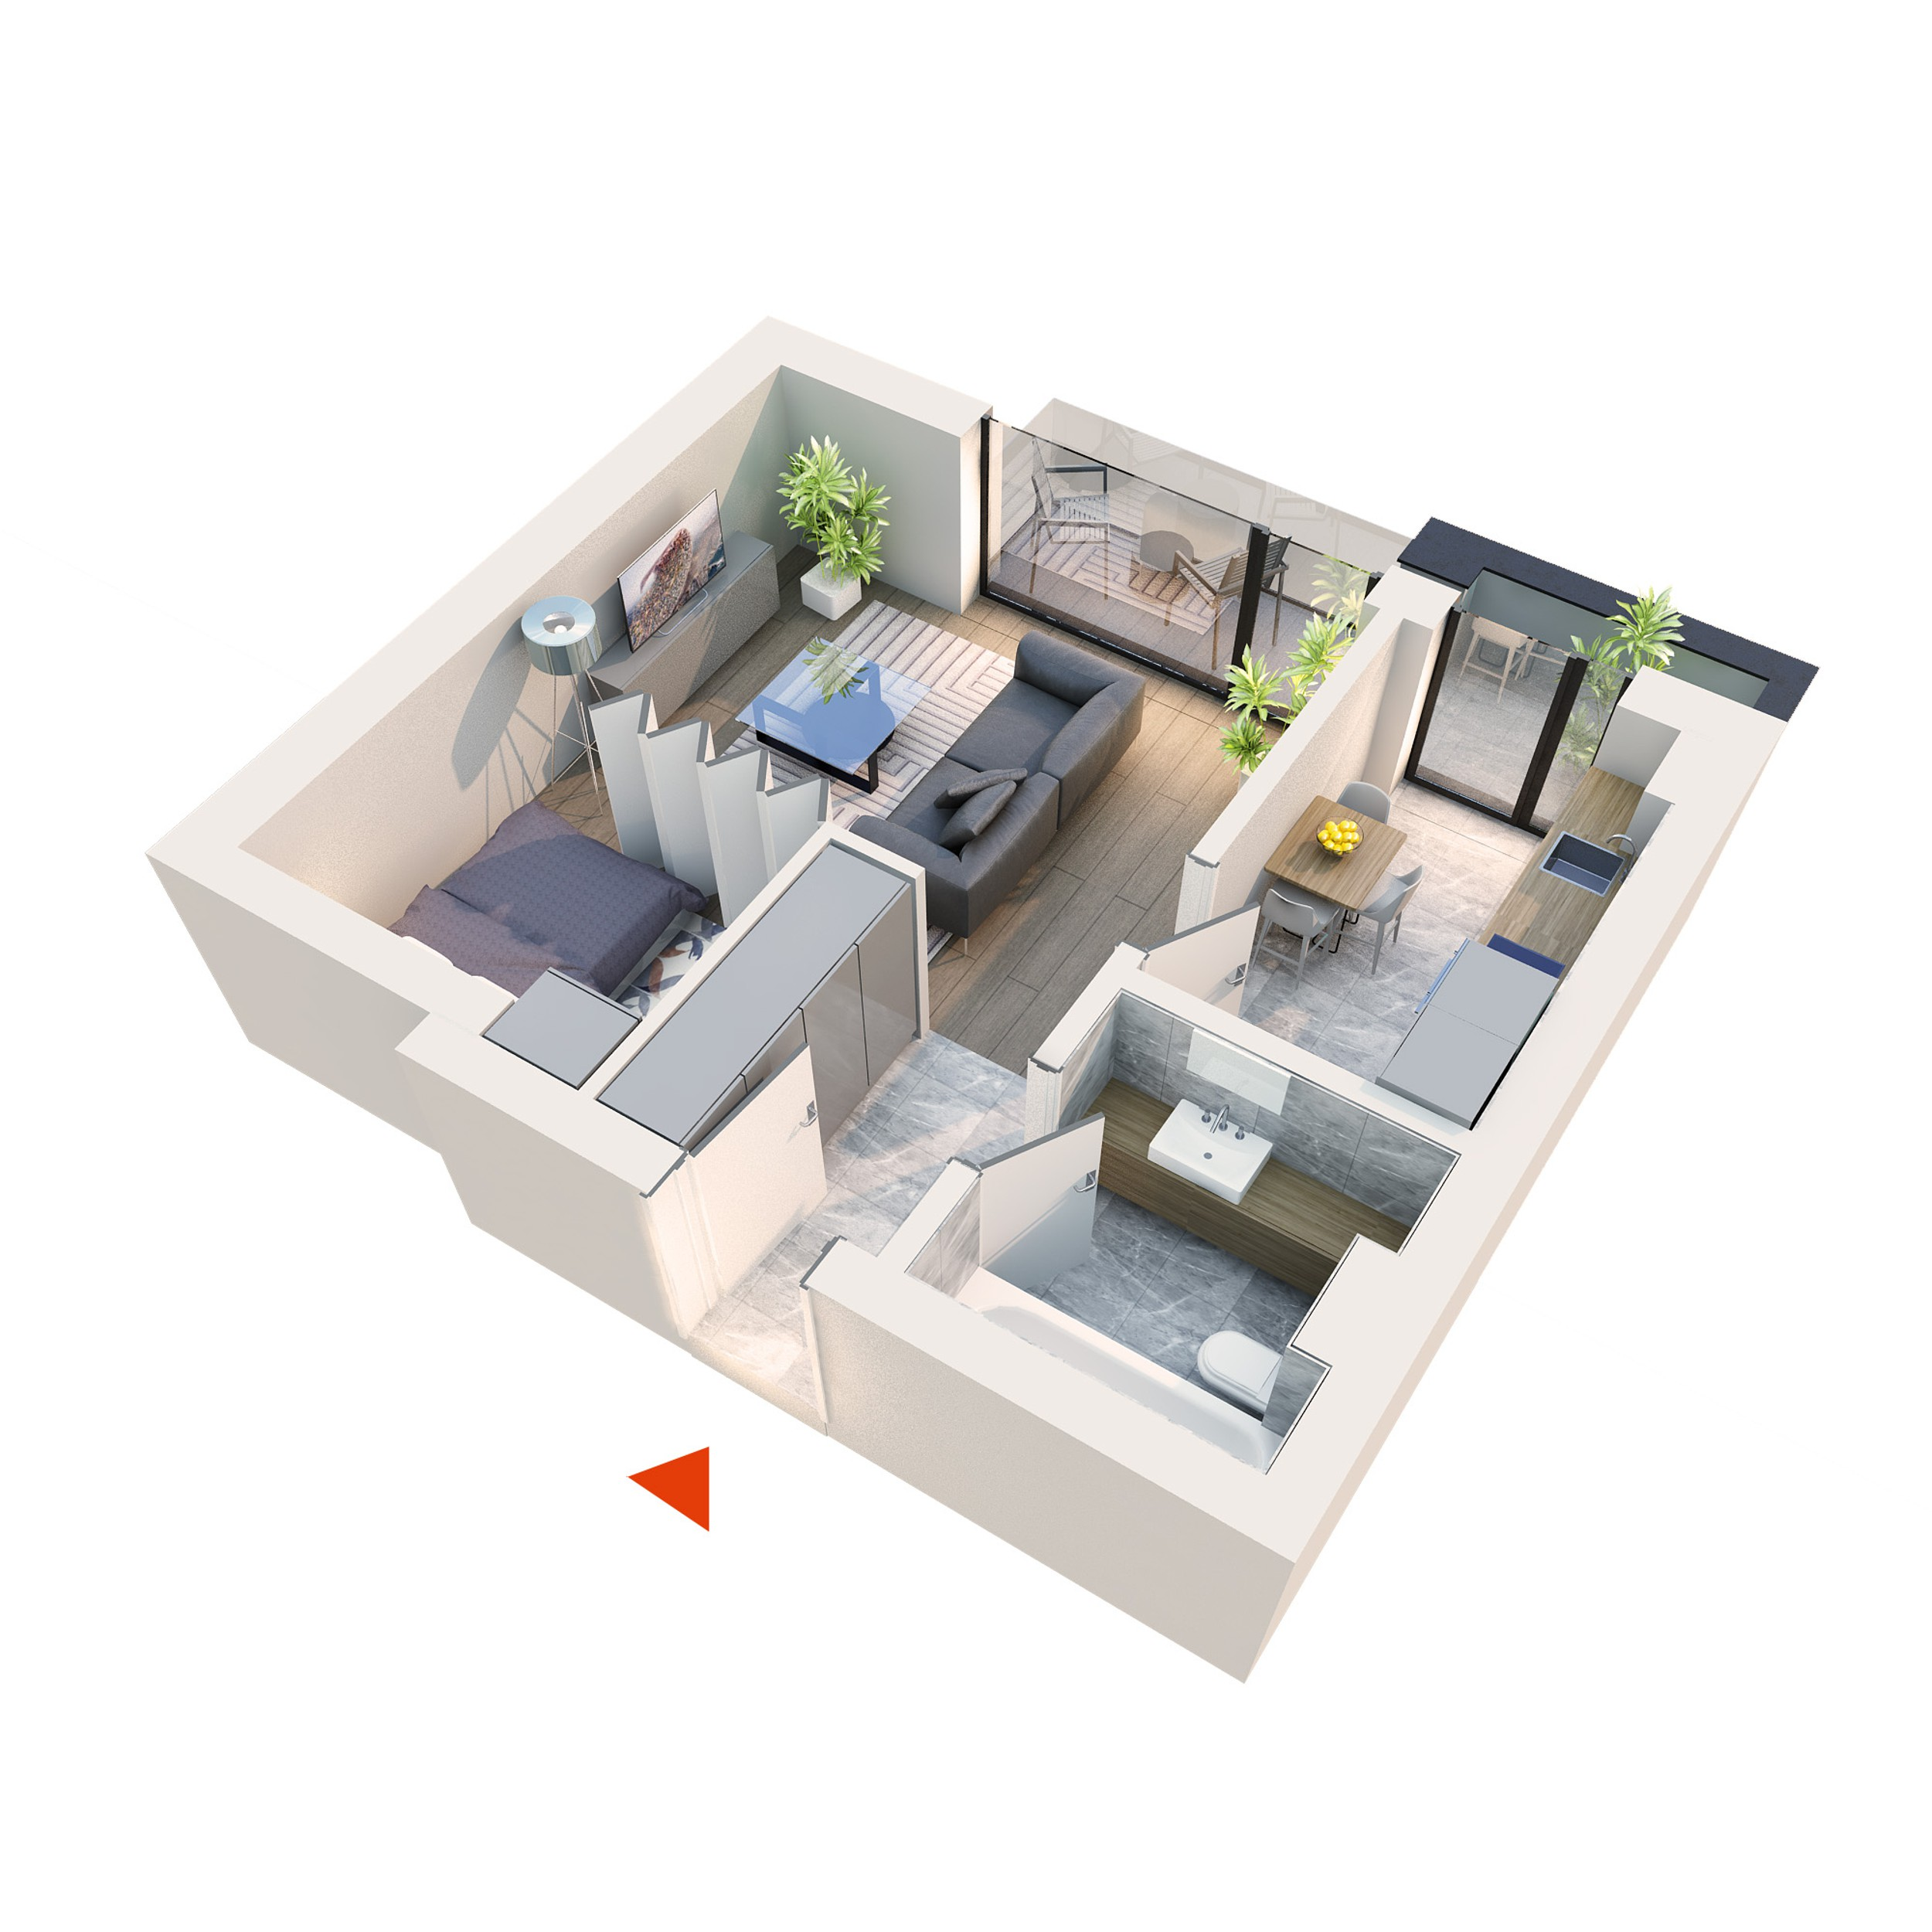 Apartament Studio tip 1C2 | Balcon | Etaj 4 | Corp C3 C4 | Faza 2